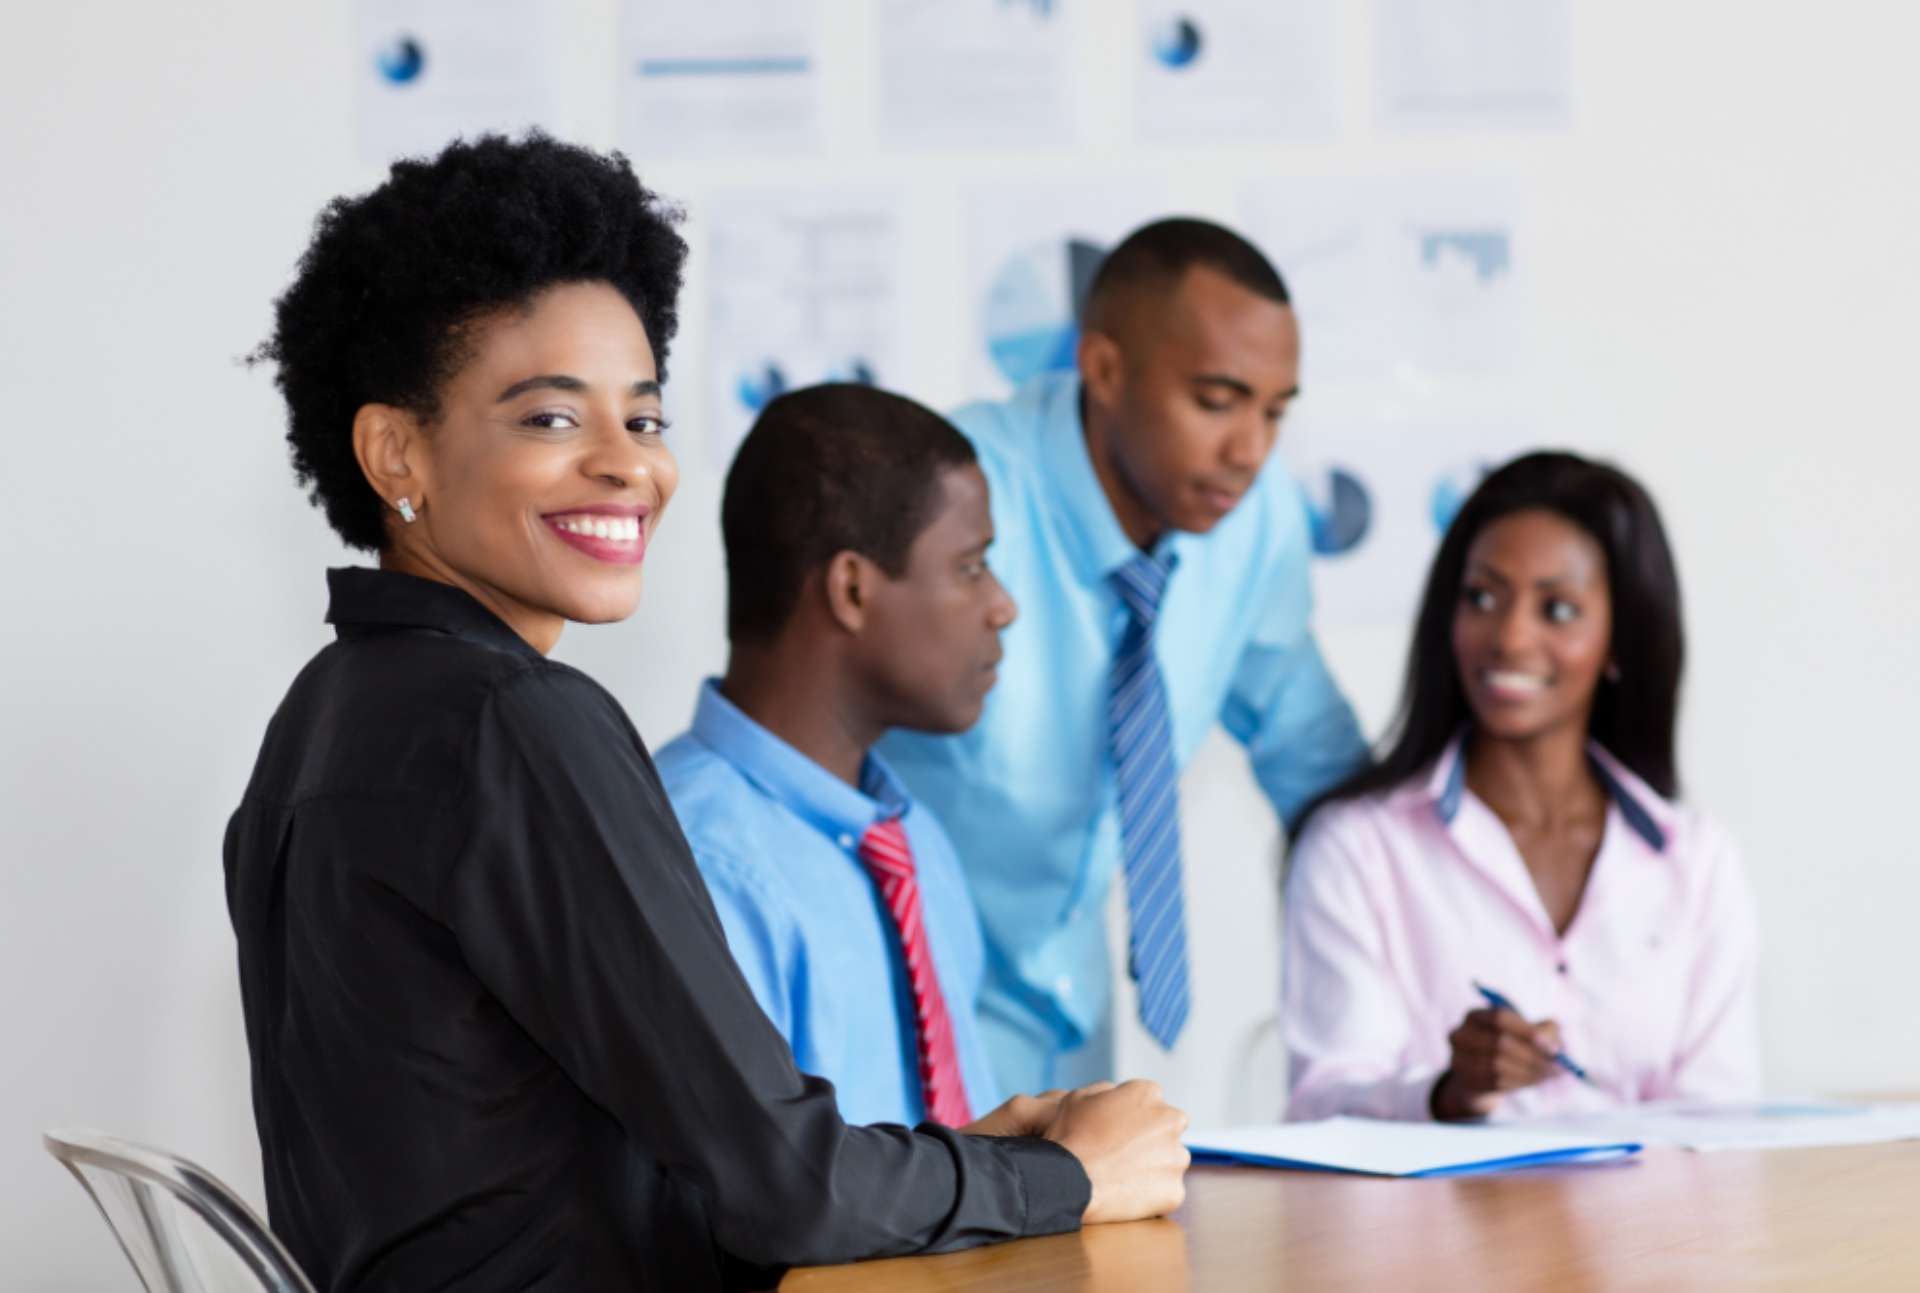 Engajamento corporativo: 7 etapas para driblar os maiores desafios empresariais do mercado